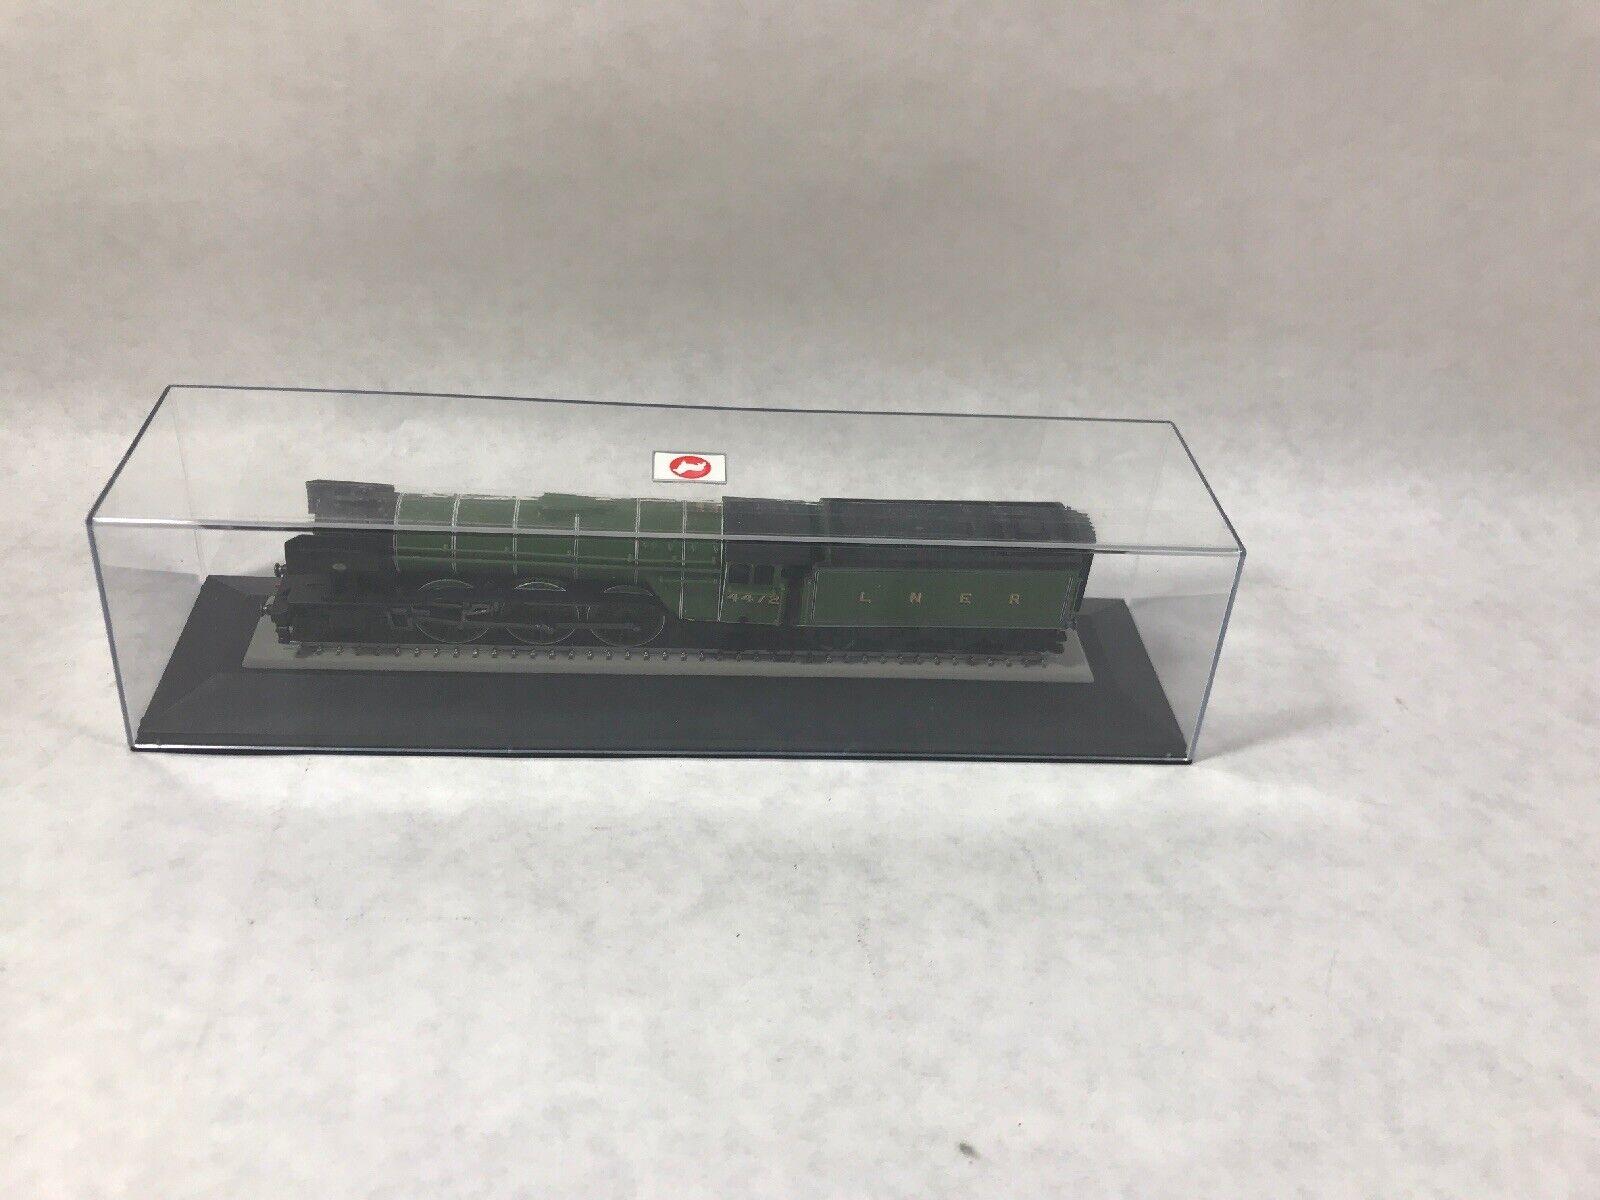 Hornby Flying Scotsman LNER 4472 Model Train Locomotive with Corgi Case